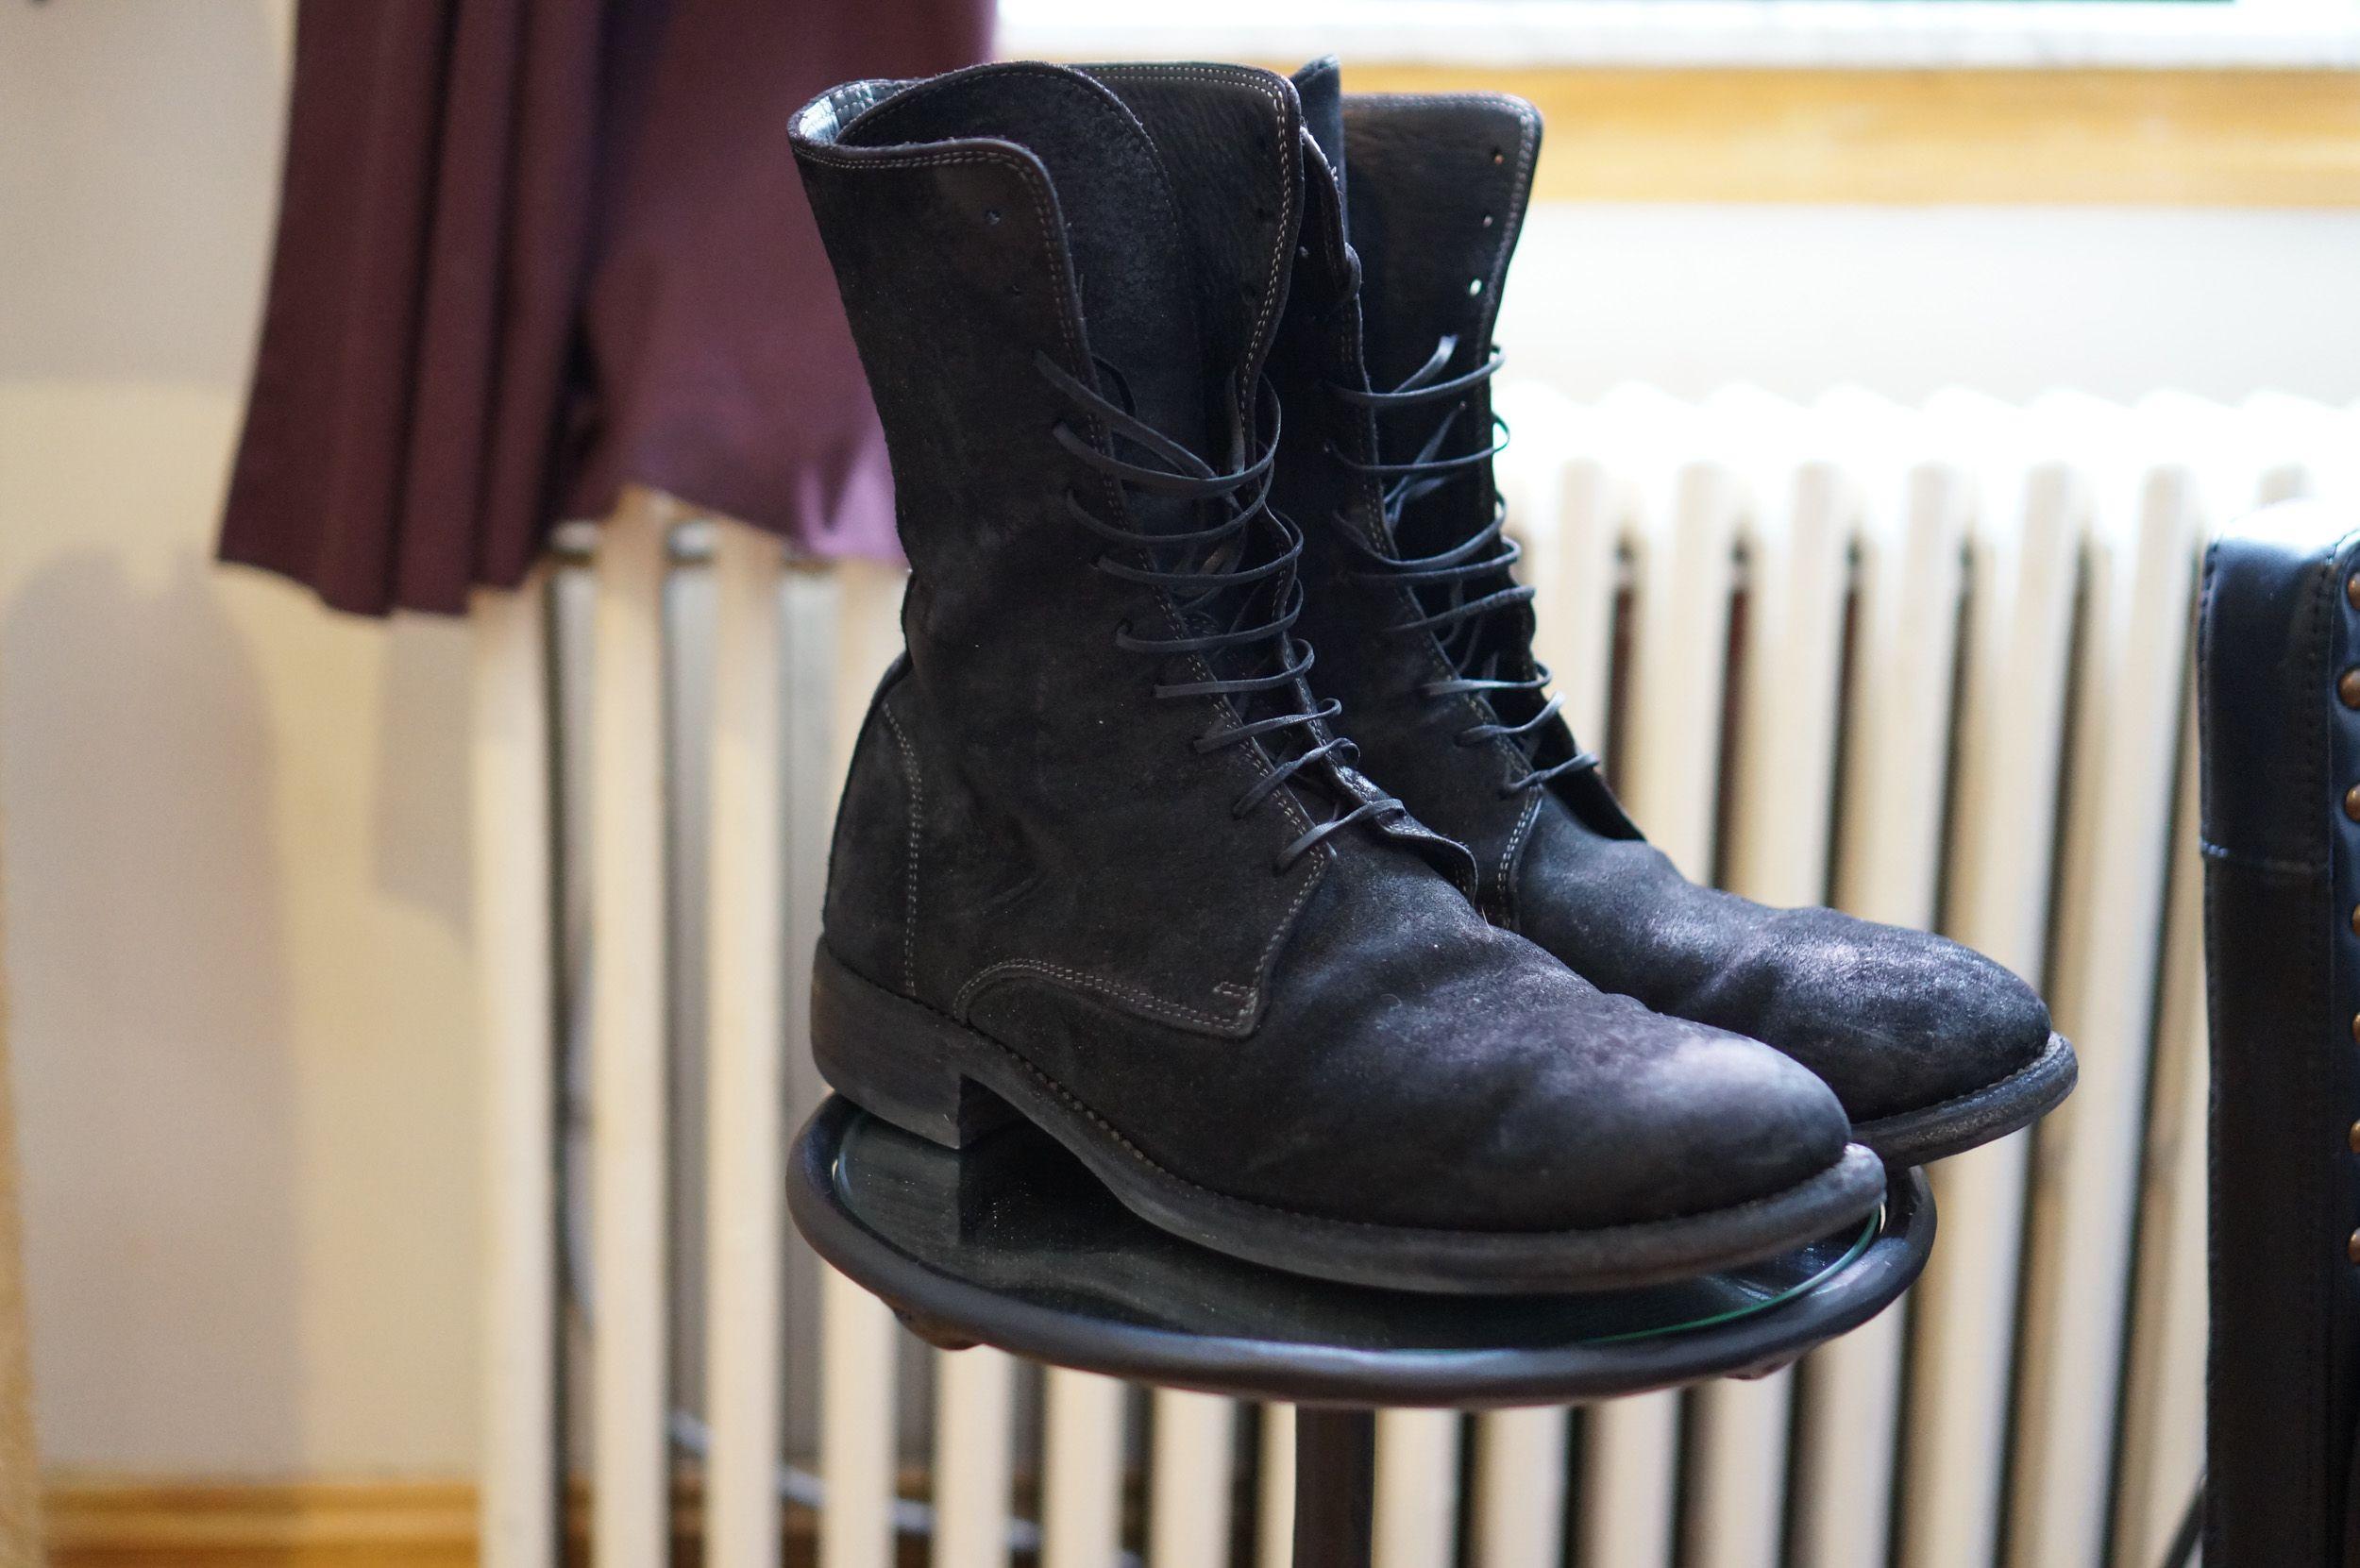 155a0559c7486 Guidi: 991 Cordovan Cont. reverse horse leather boot | No.714 ...